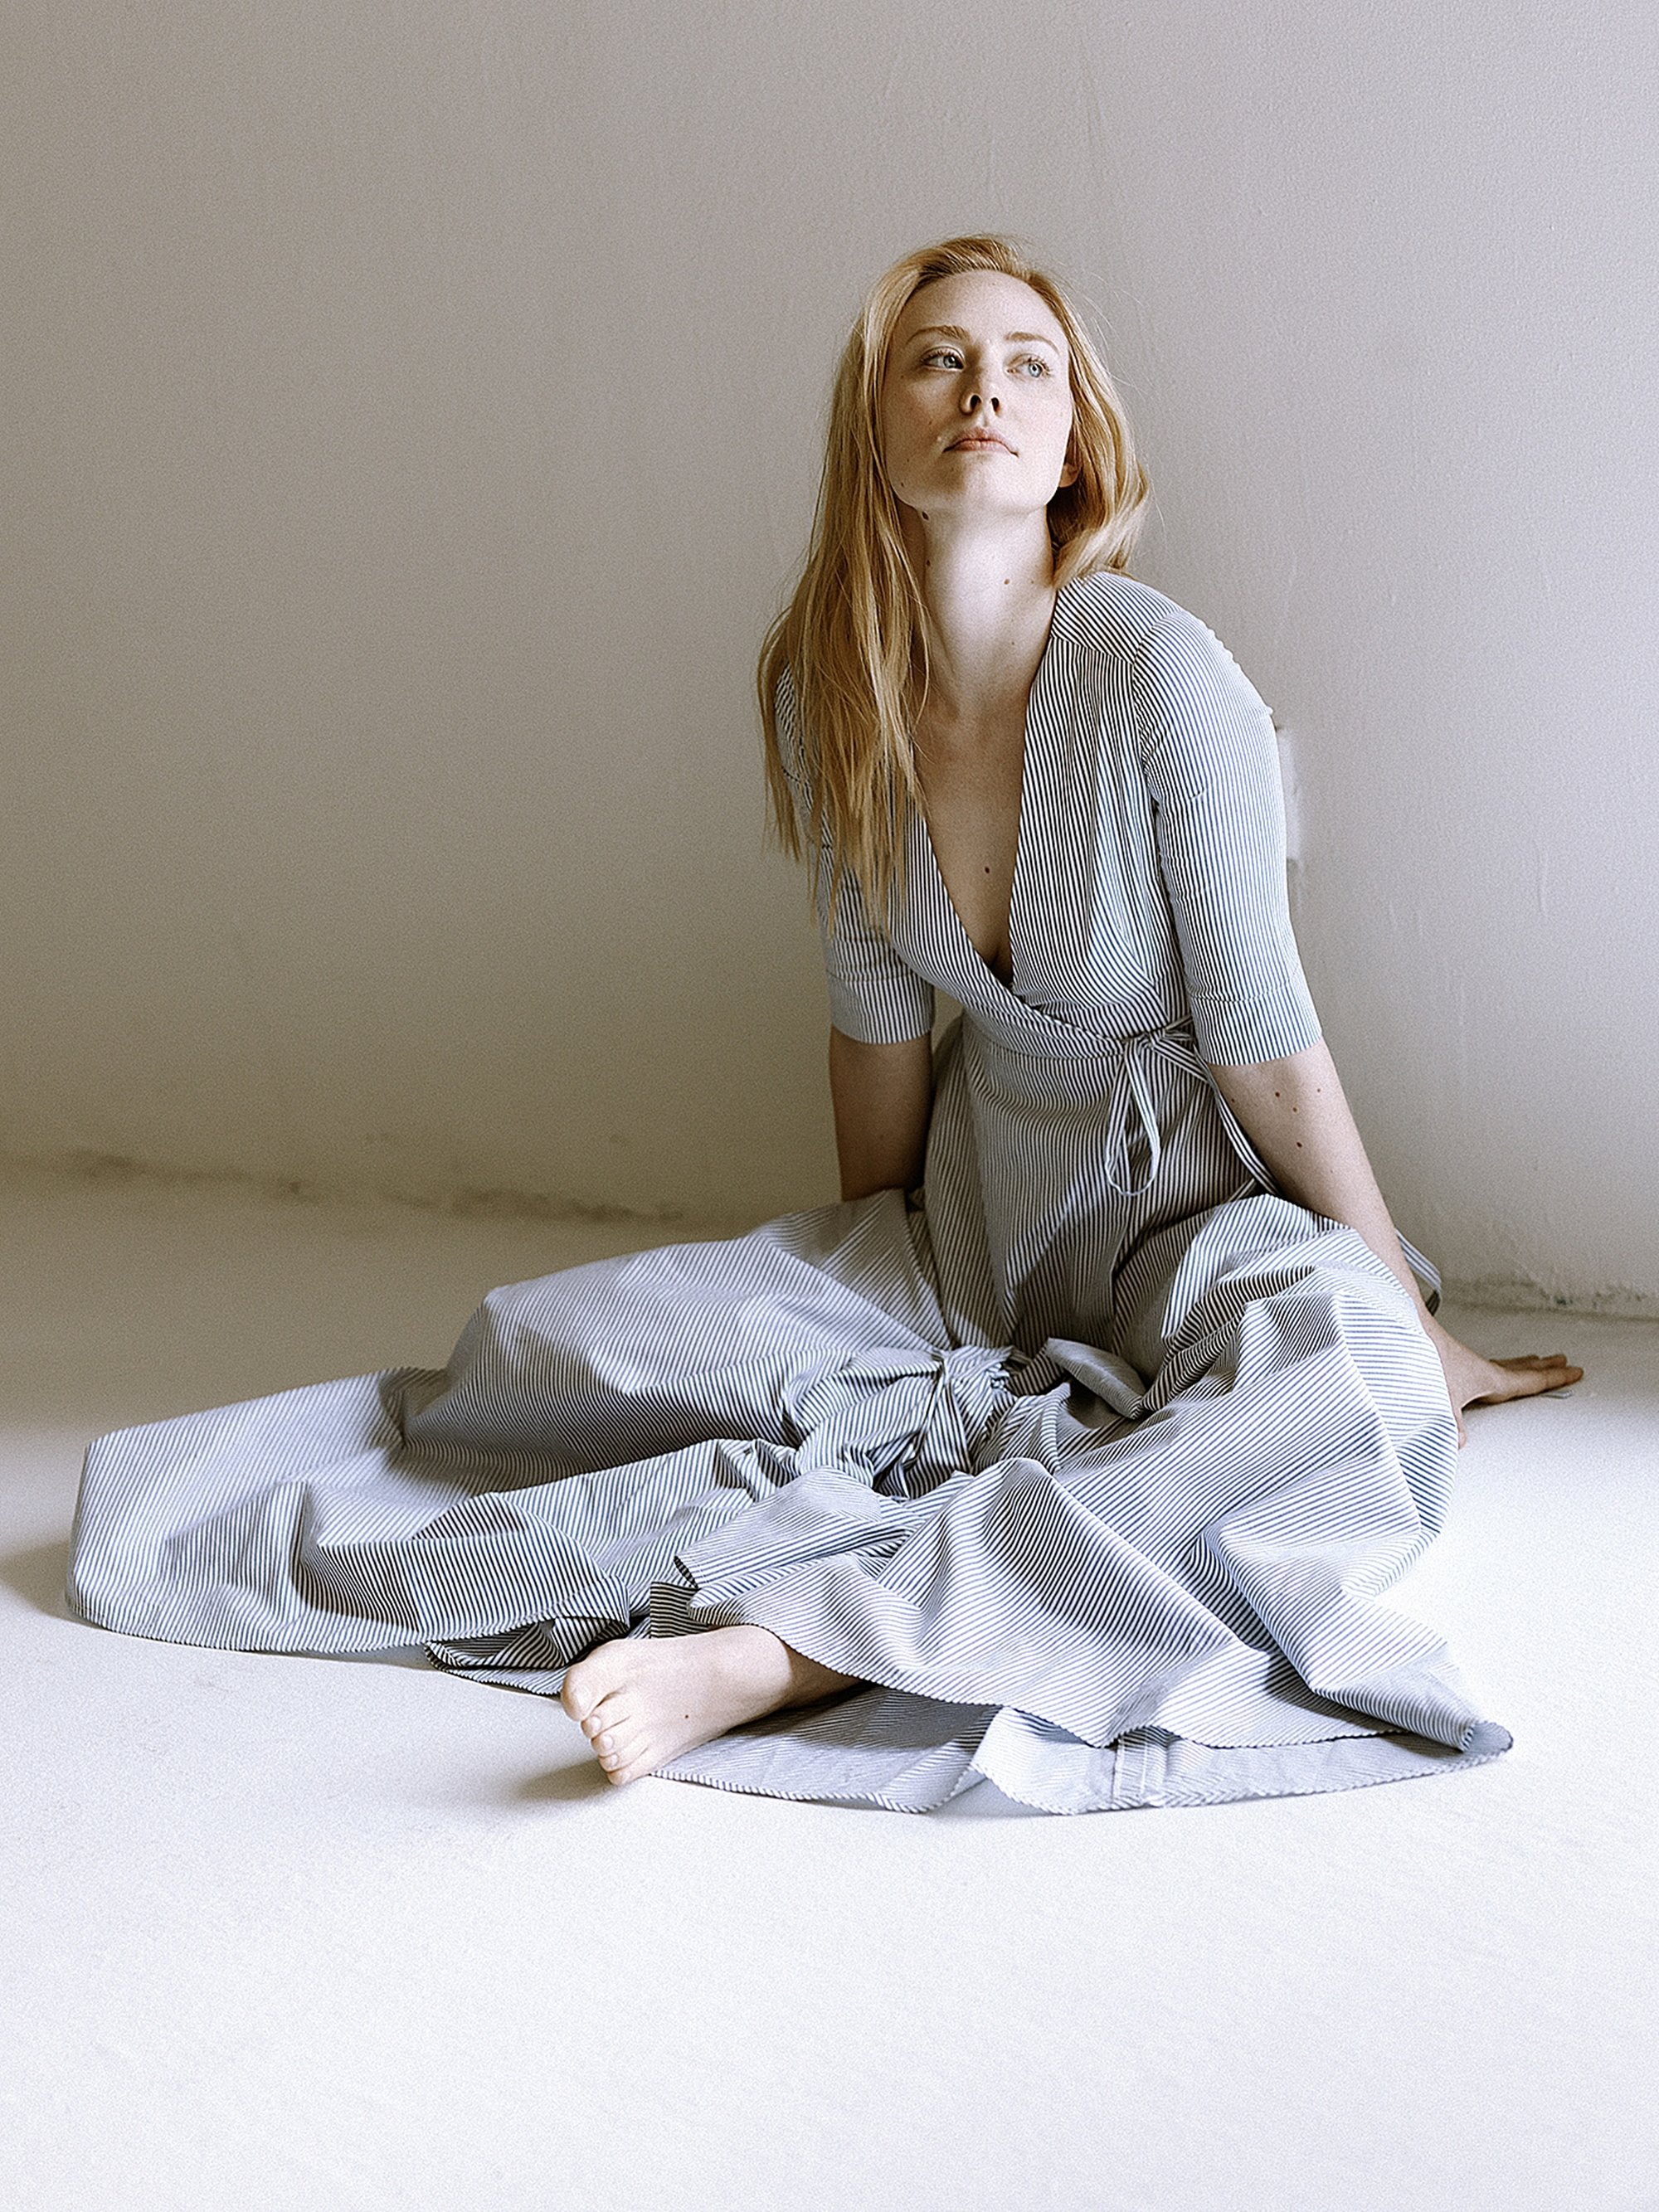 Feet Deborah Ann Woll naked (48 foto and video), Sexy, Fappening, Selfie, braless 2018